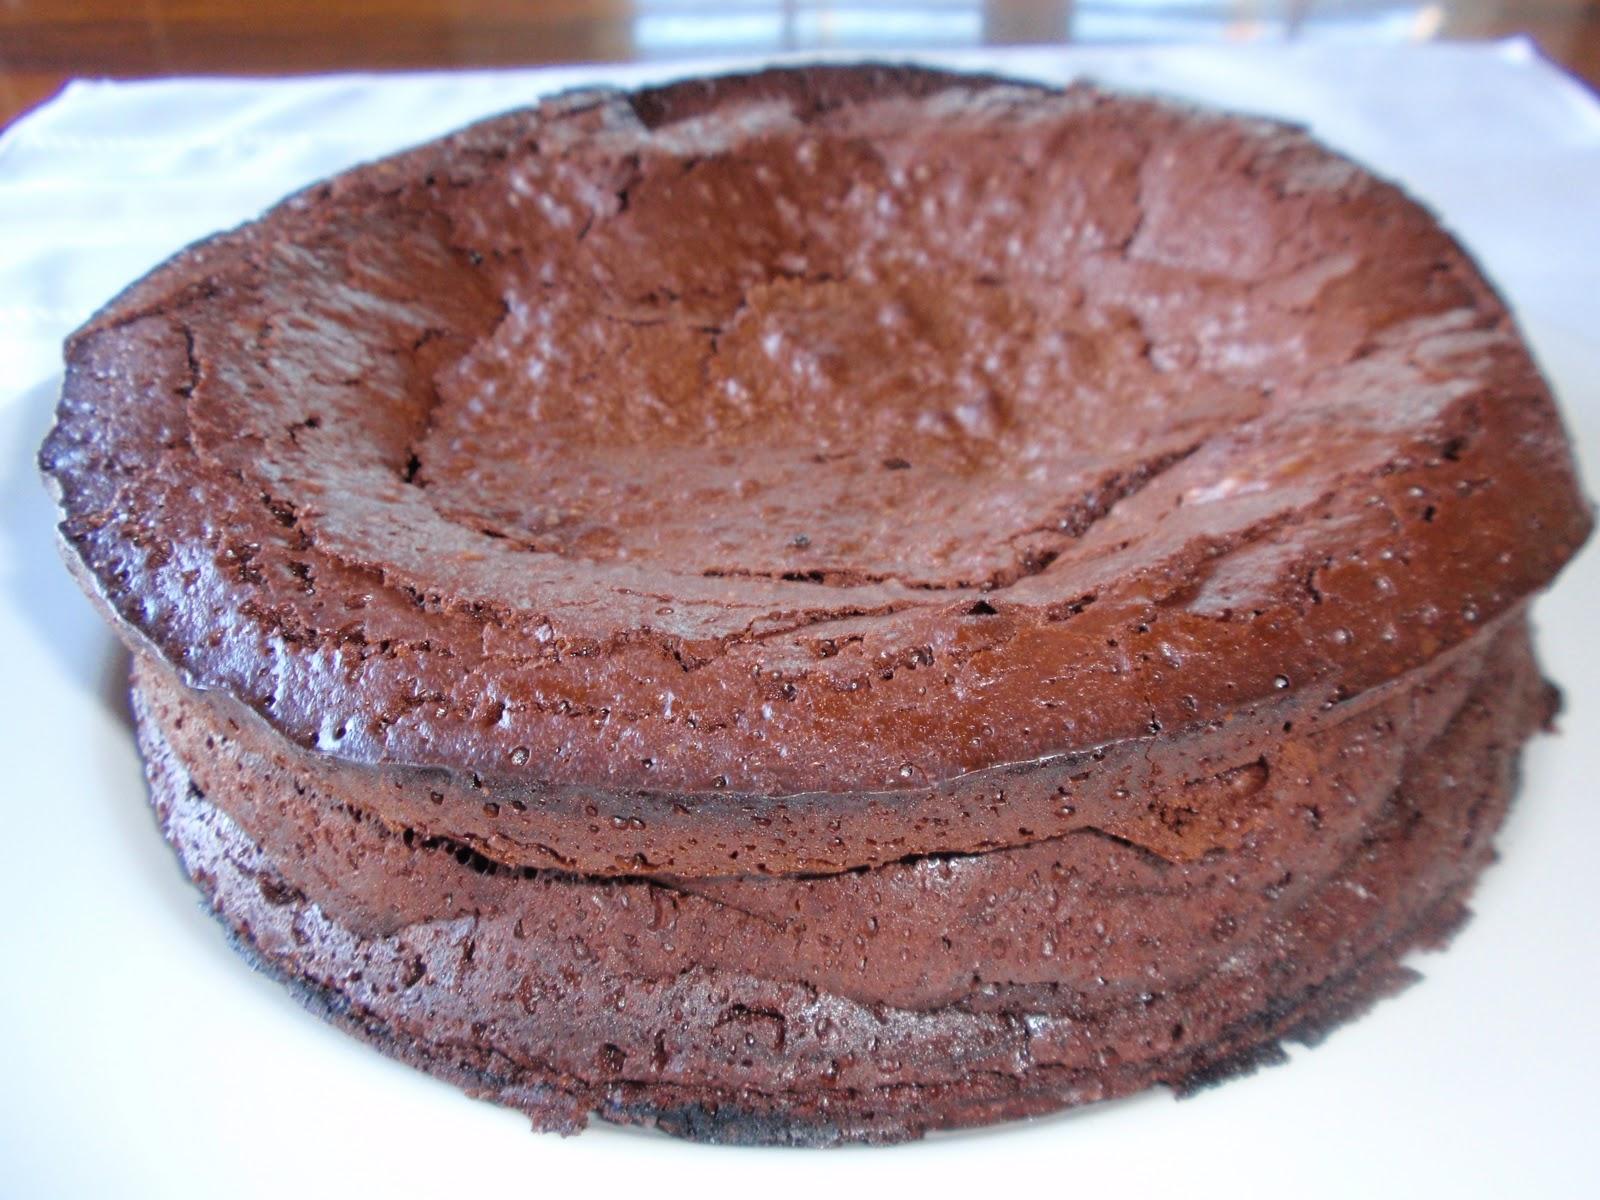 Bon Appetit An American Test Kitchen Test 26 Flourless Chocolate Cake With Caramel Or Raspberry Sauce